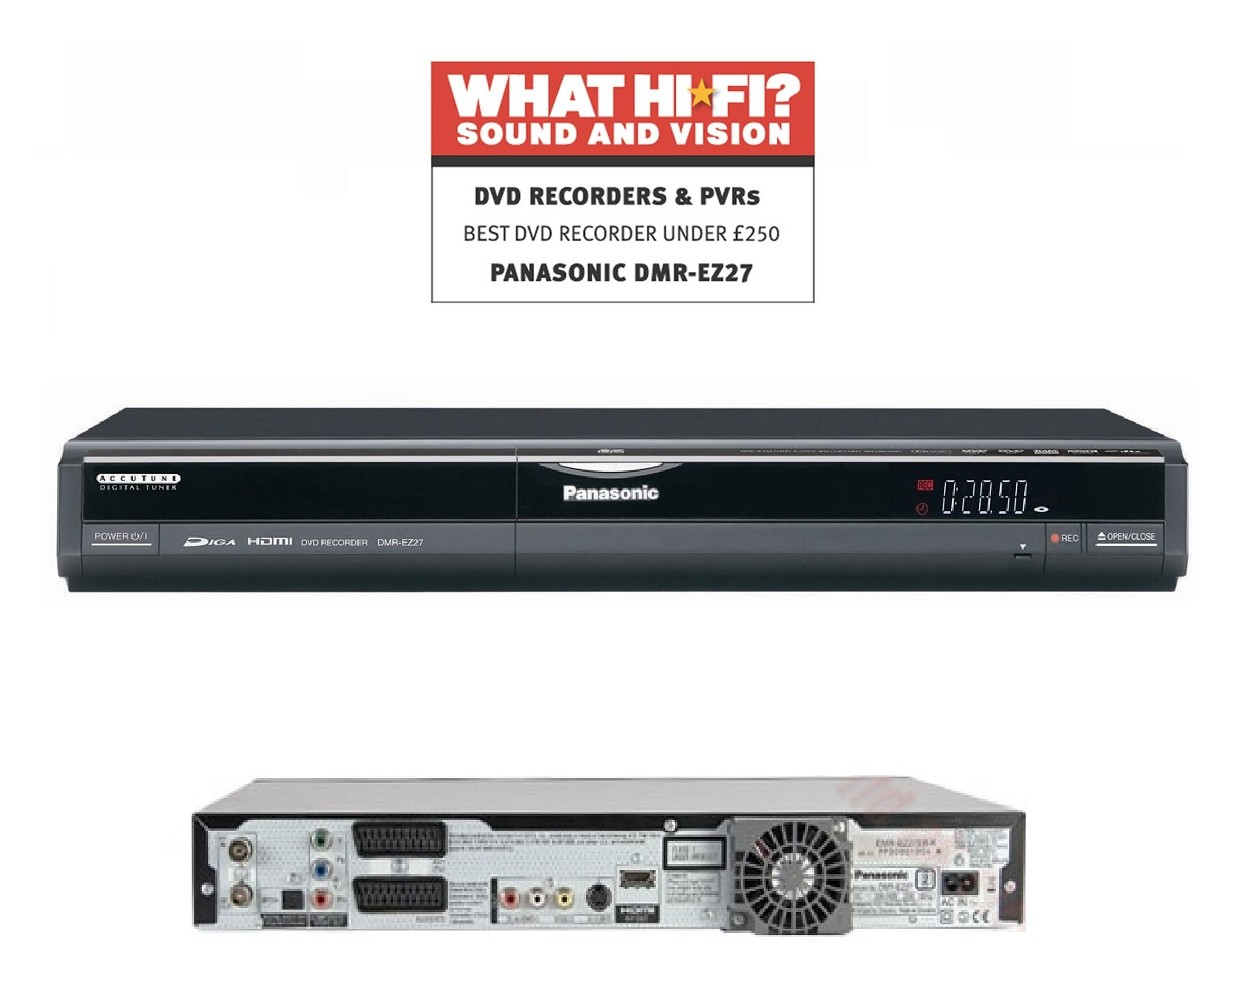 panasonic multiregion dmr ez27 dvd recorder freeview hdmi digital rh ebay ie Panasonic DVD Recorder DMR- EZ48V panasonic dvd recorder dmr ez27 manual